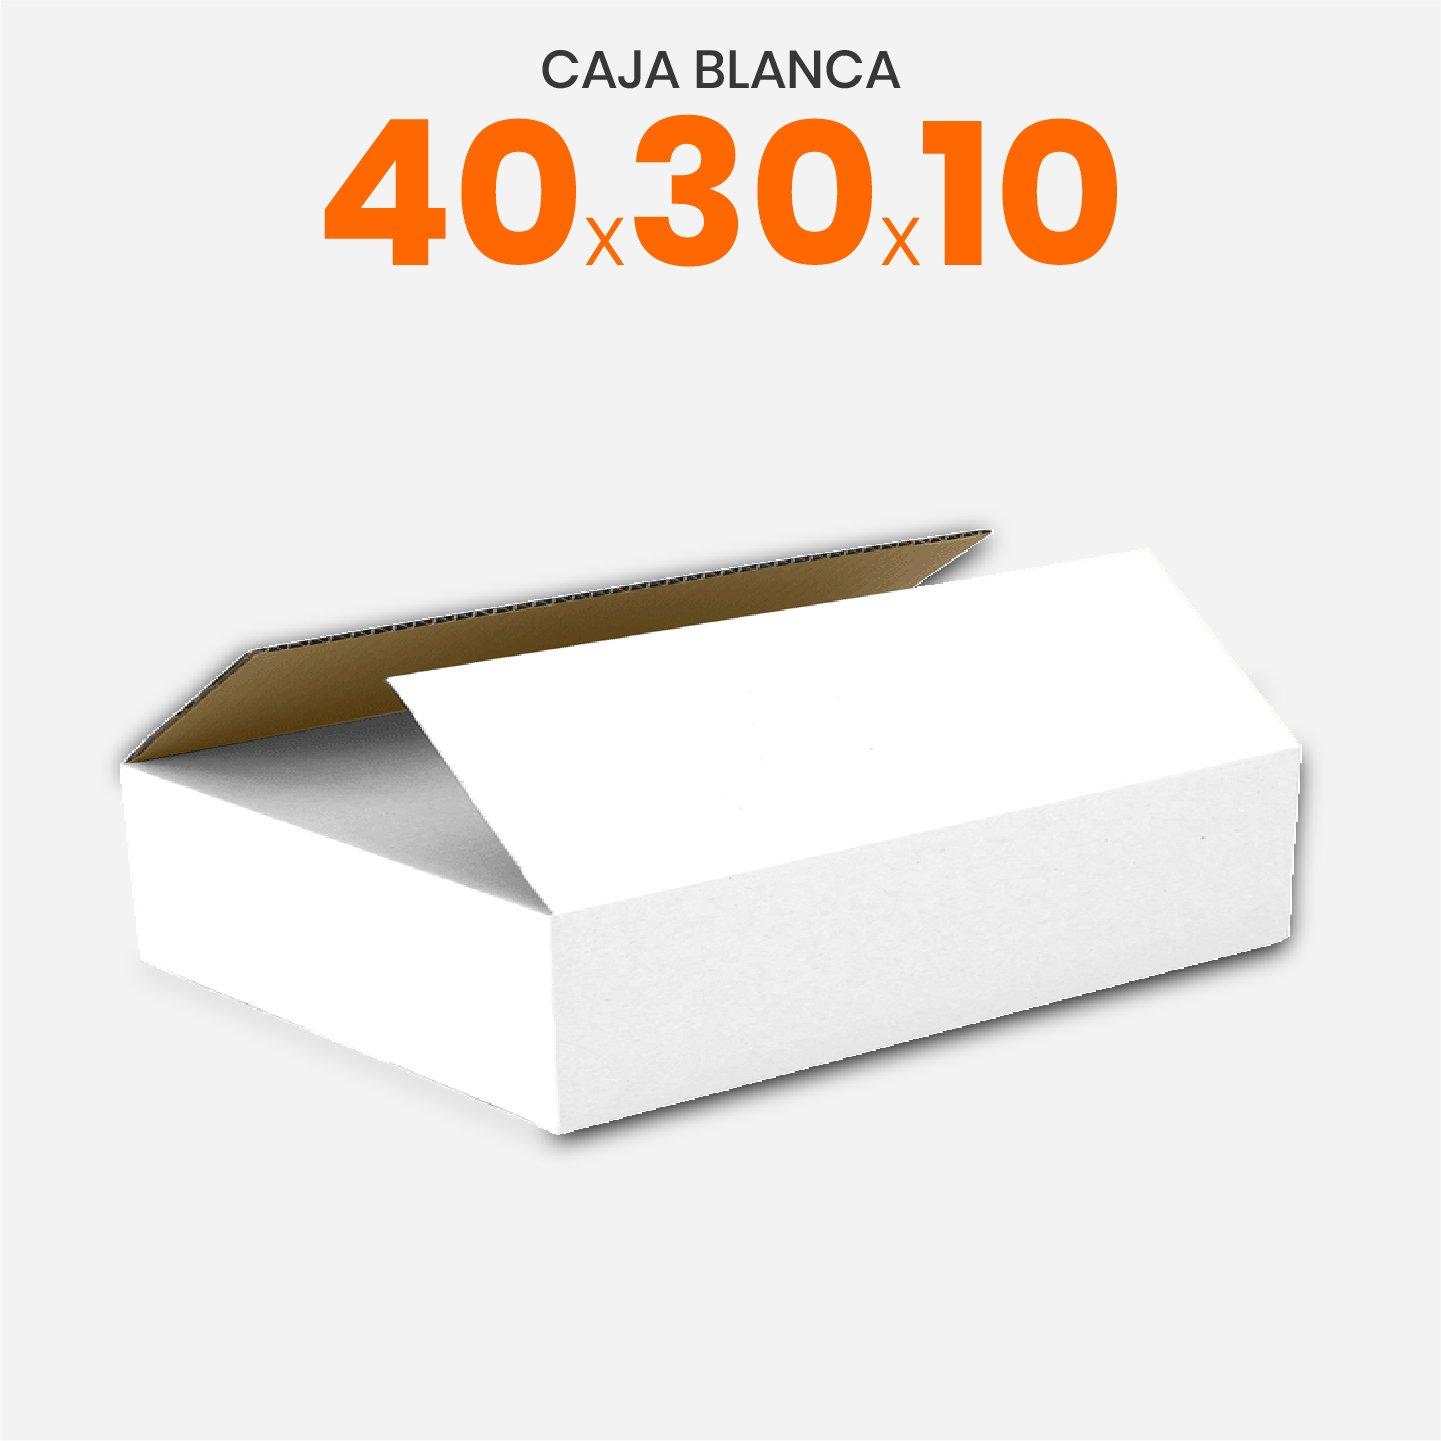 Caja De Cartón Corrugado Blanca 40x30x10